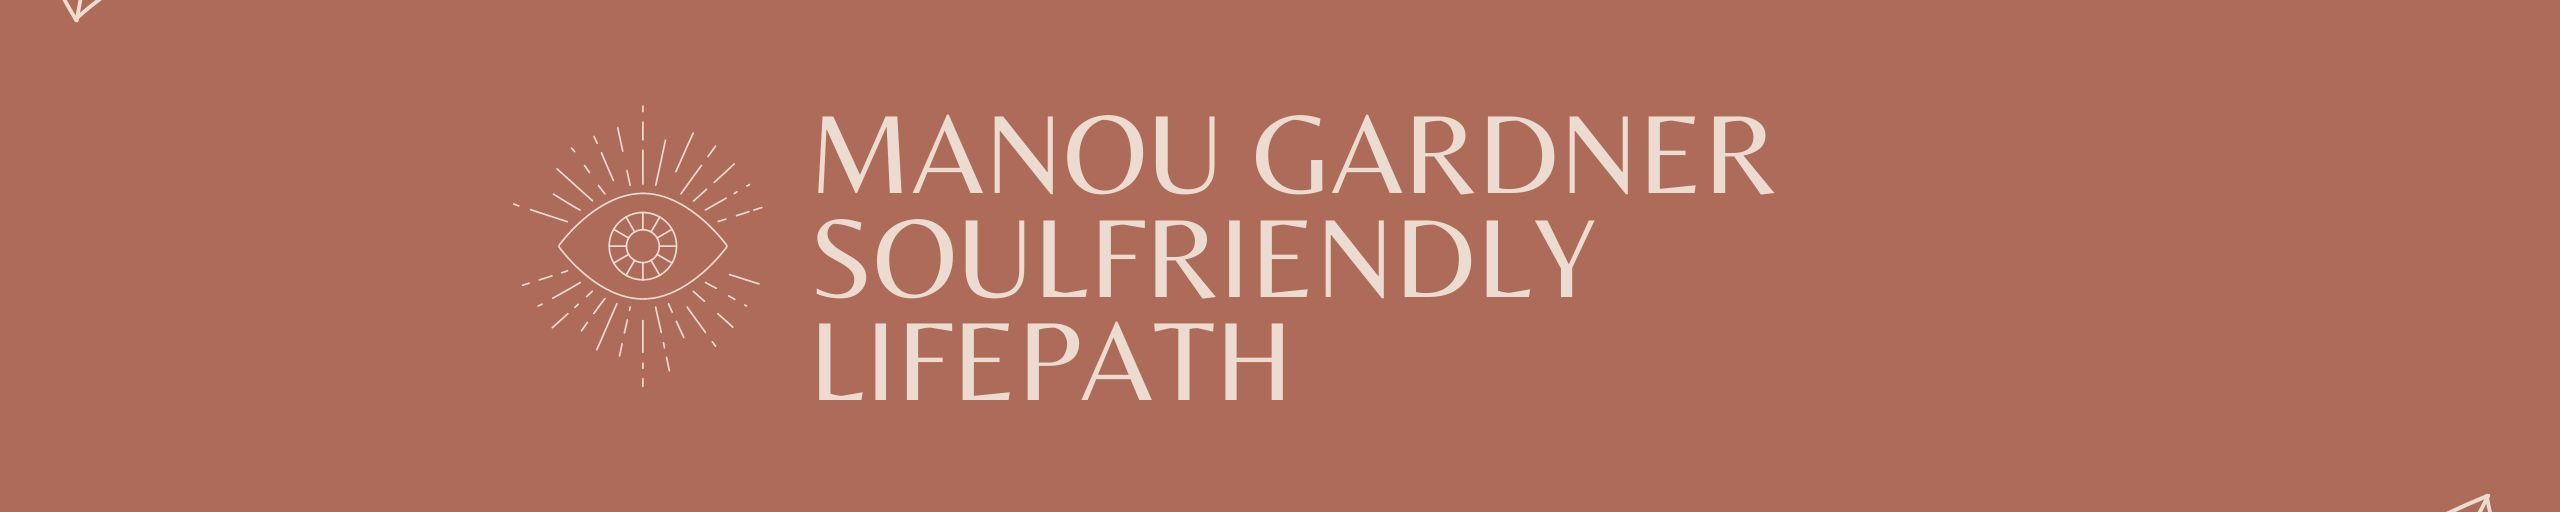 Manou Gardner Soulfriendly Lifepath